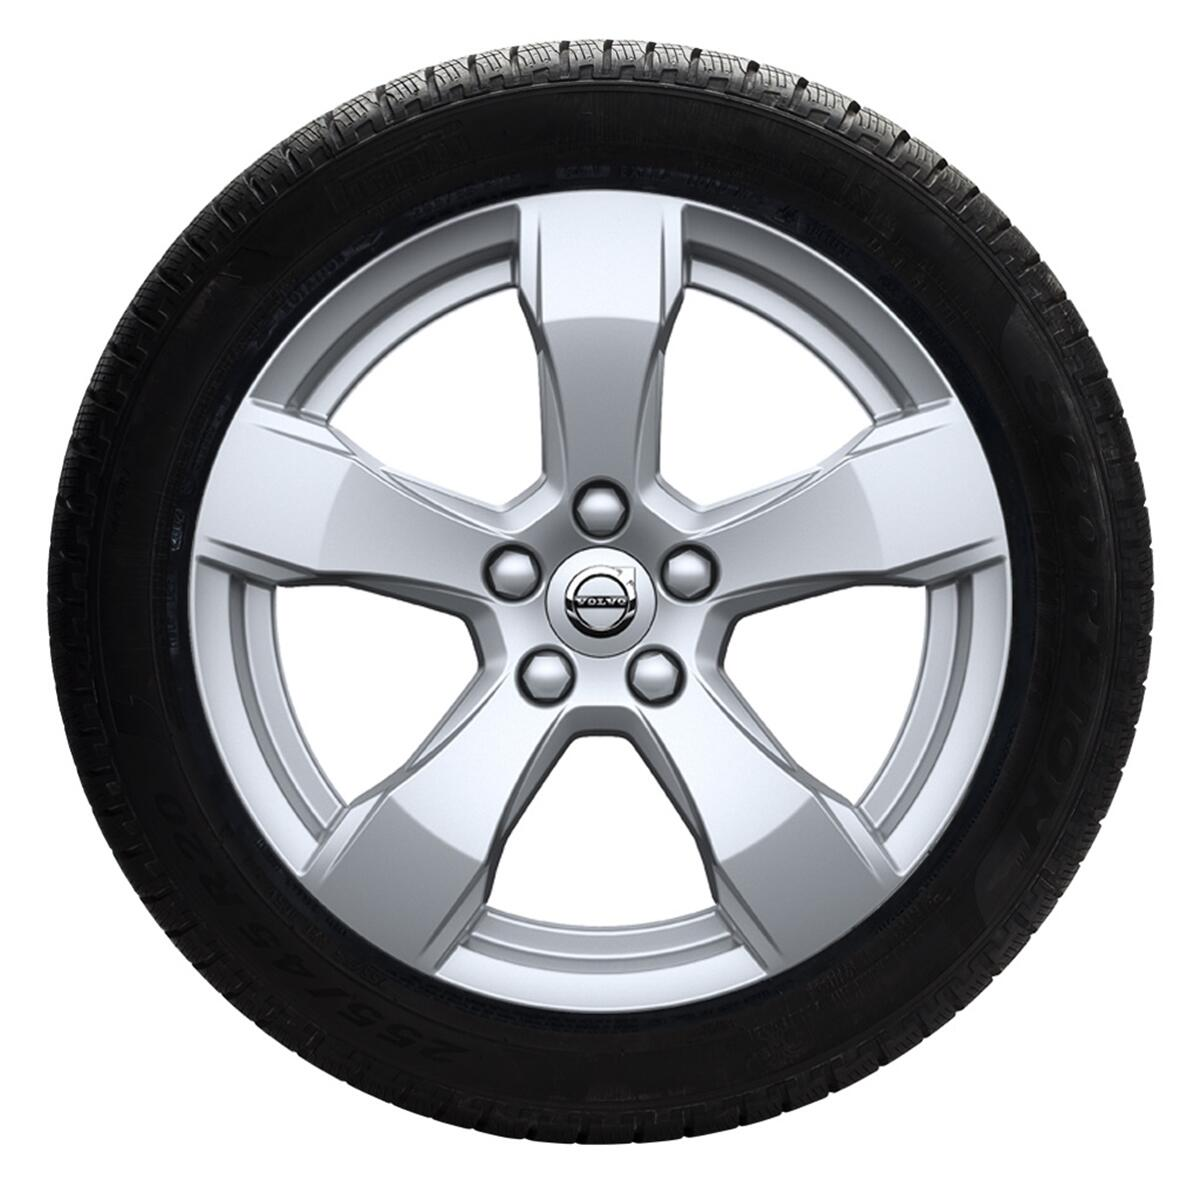 "Komplet zimskih koles: 43,18 cm (17""), pnevmatike Continental"